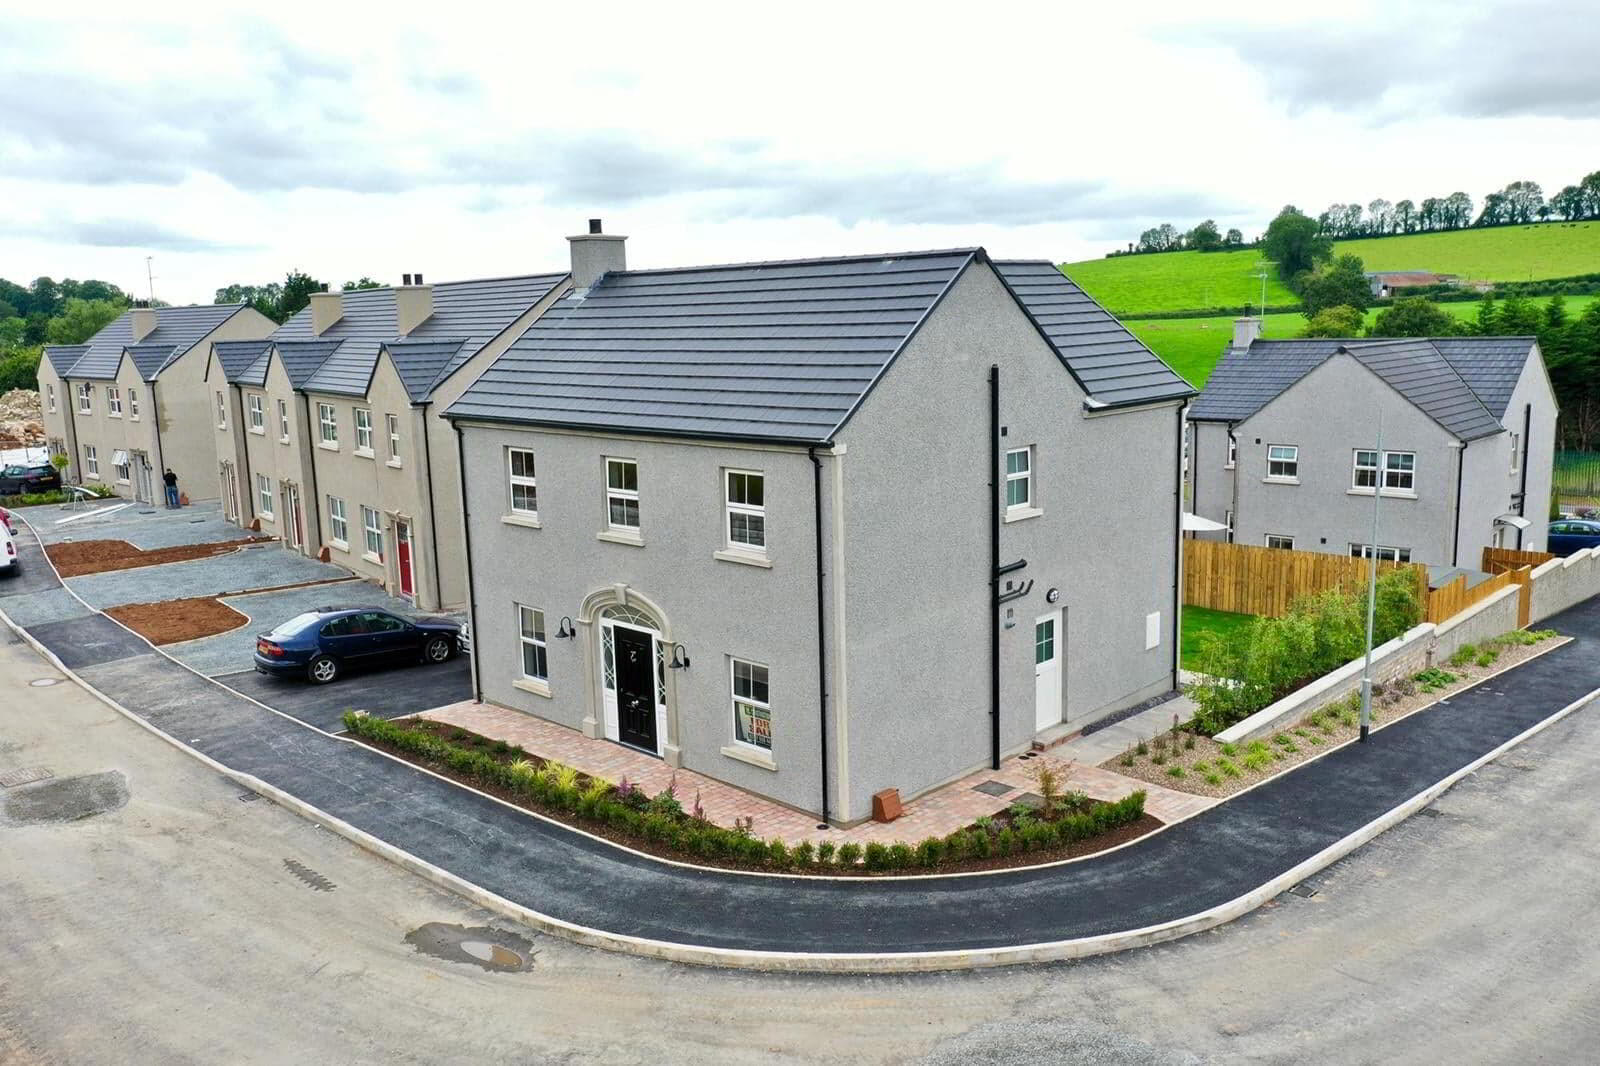 Photo 1 of Crewroe Avenue, Crewroe Avenue, Armagh